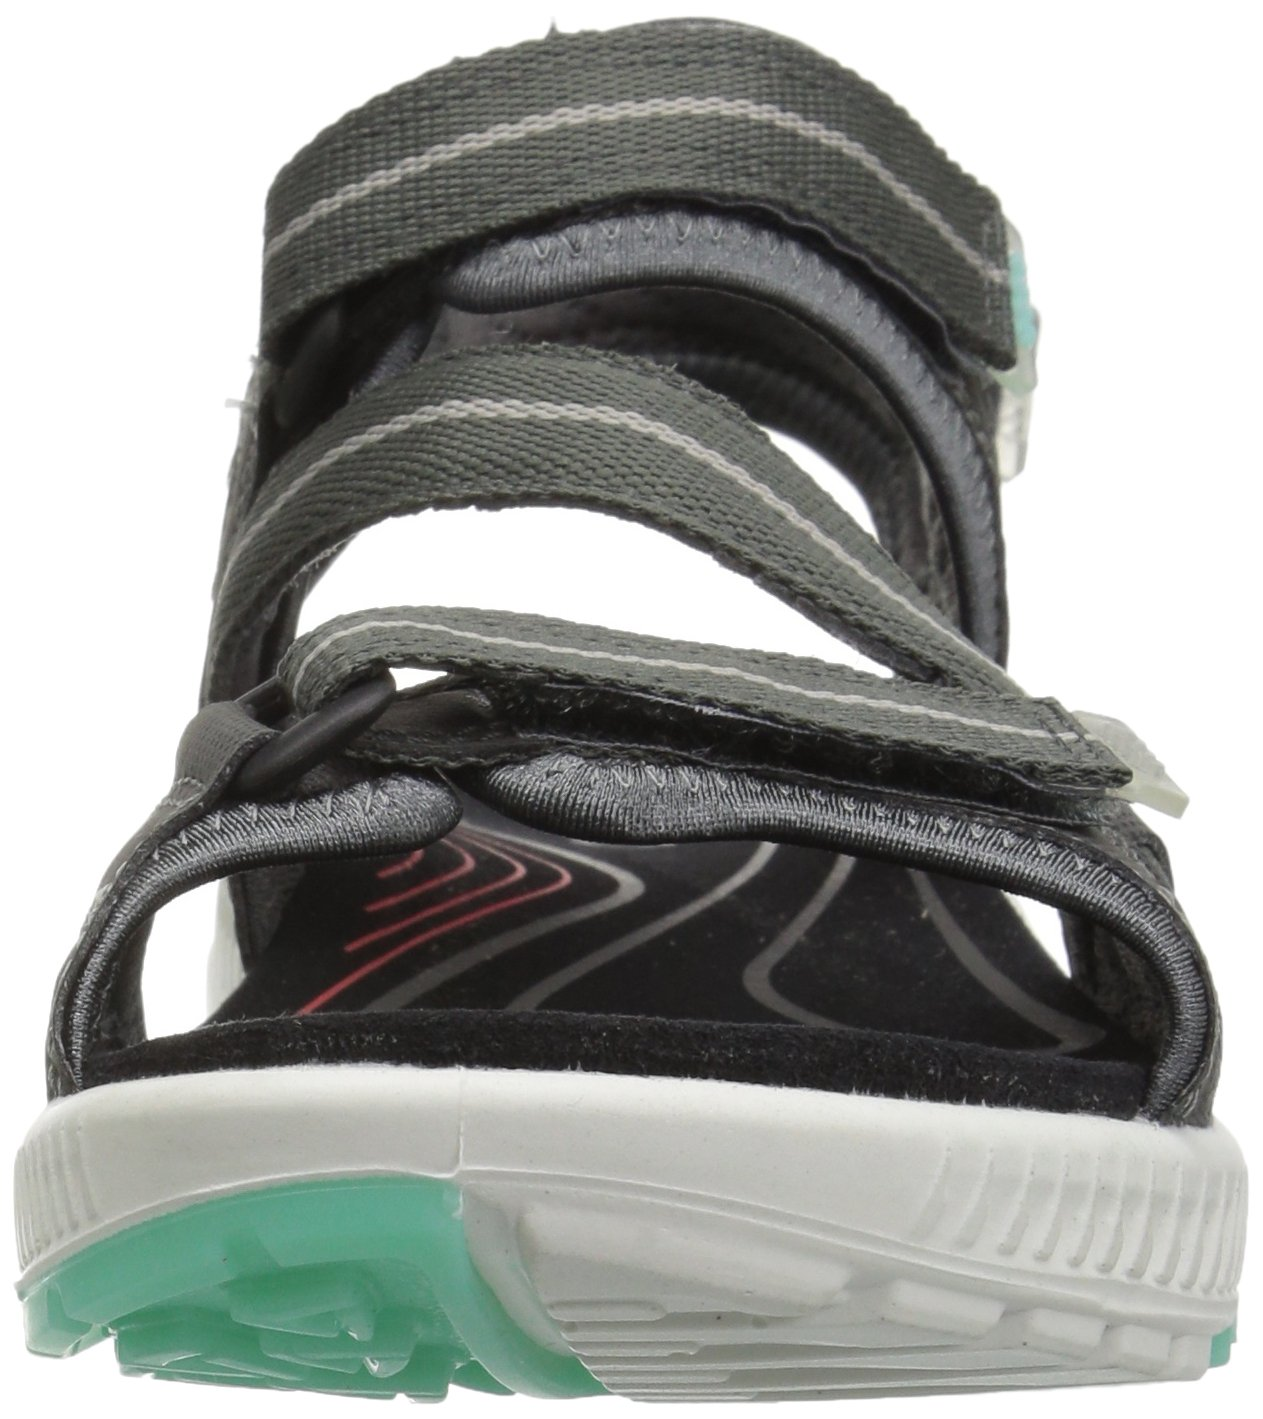 ECCO Women's Terra 3S Athletic Sandal B072F26DNQ 41 EU/10-10.5 M US|Dark Shadow/Emerald